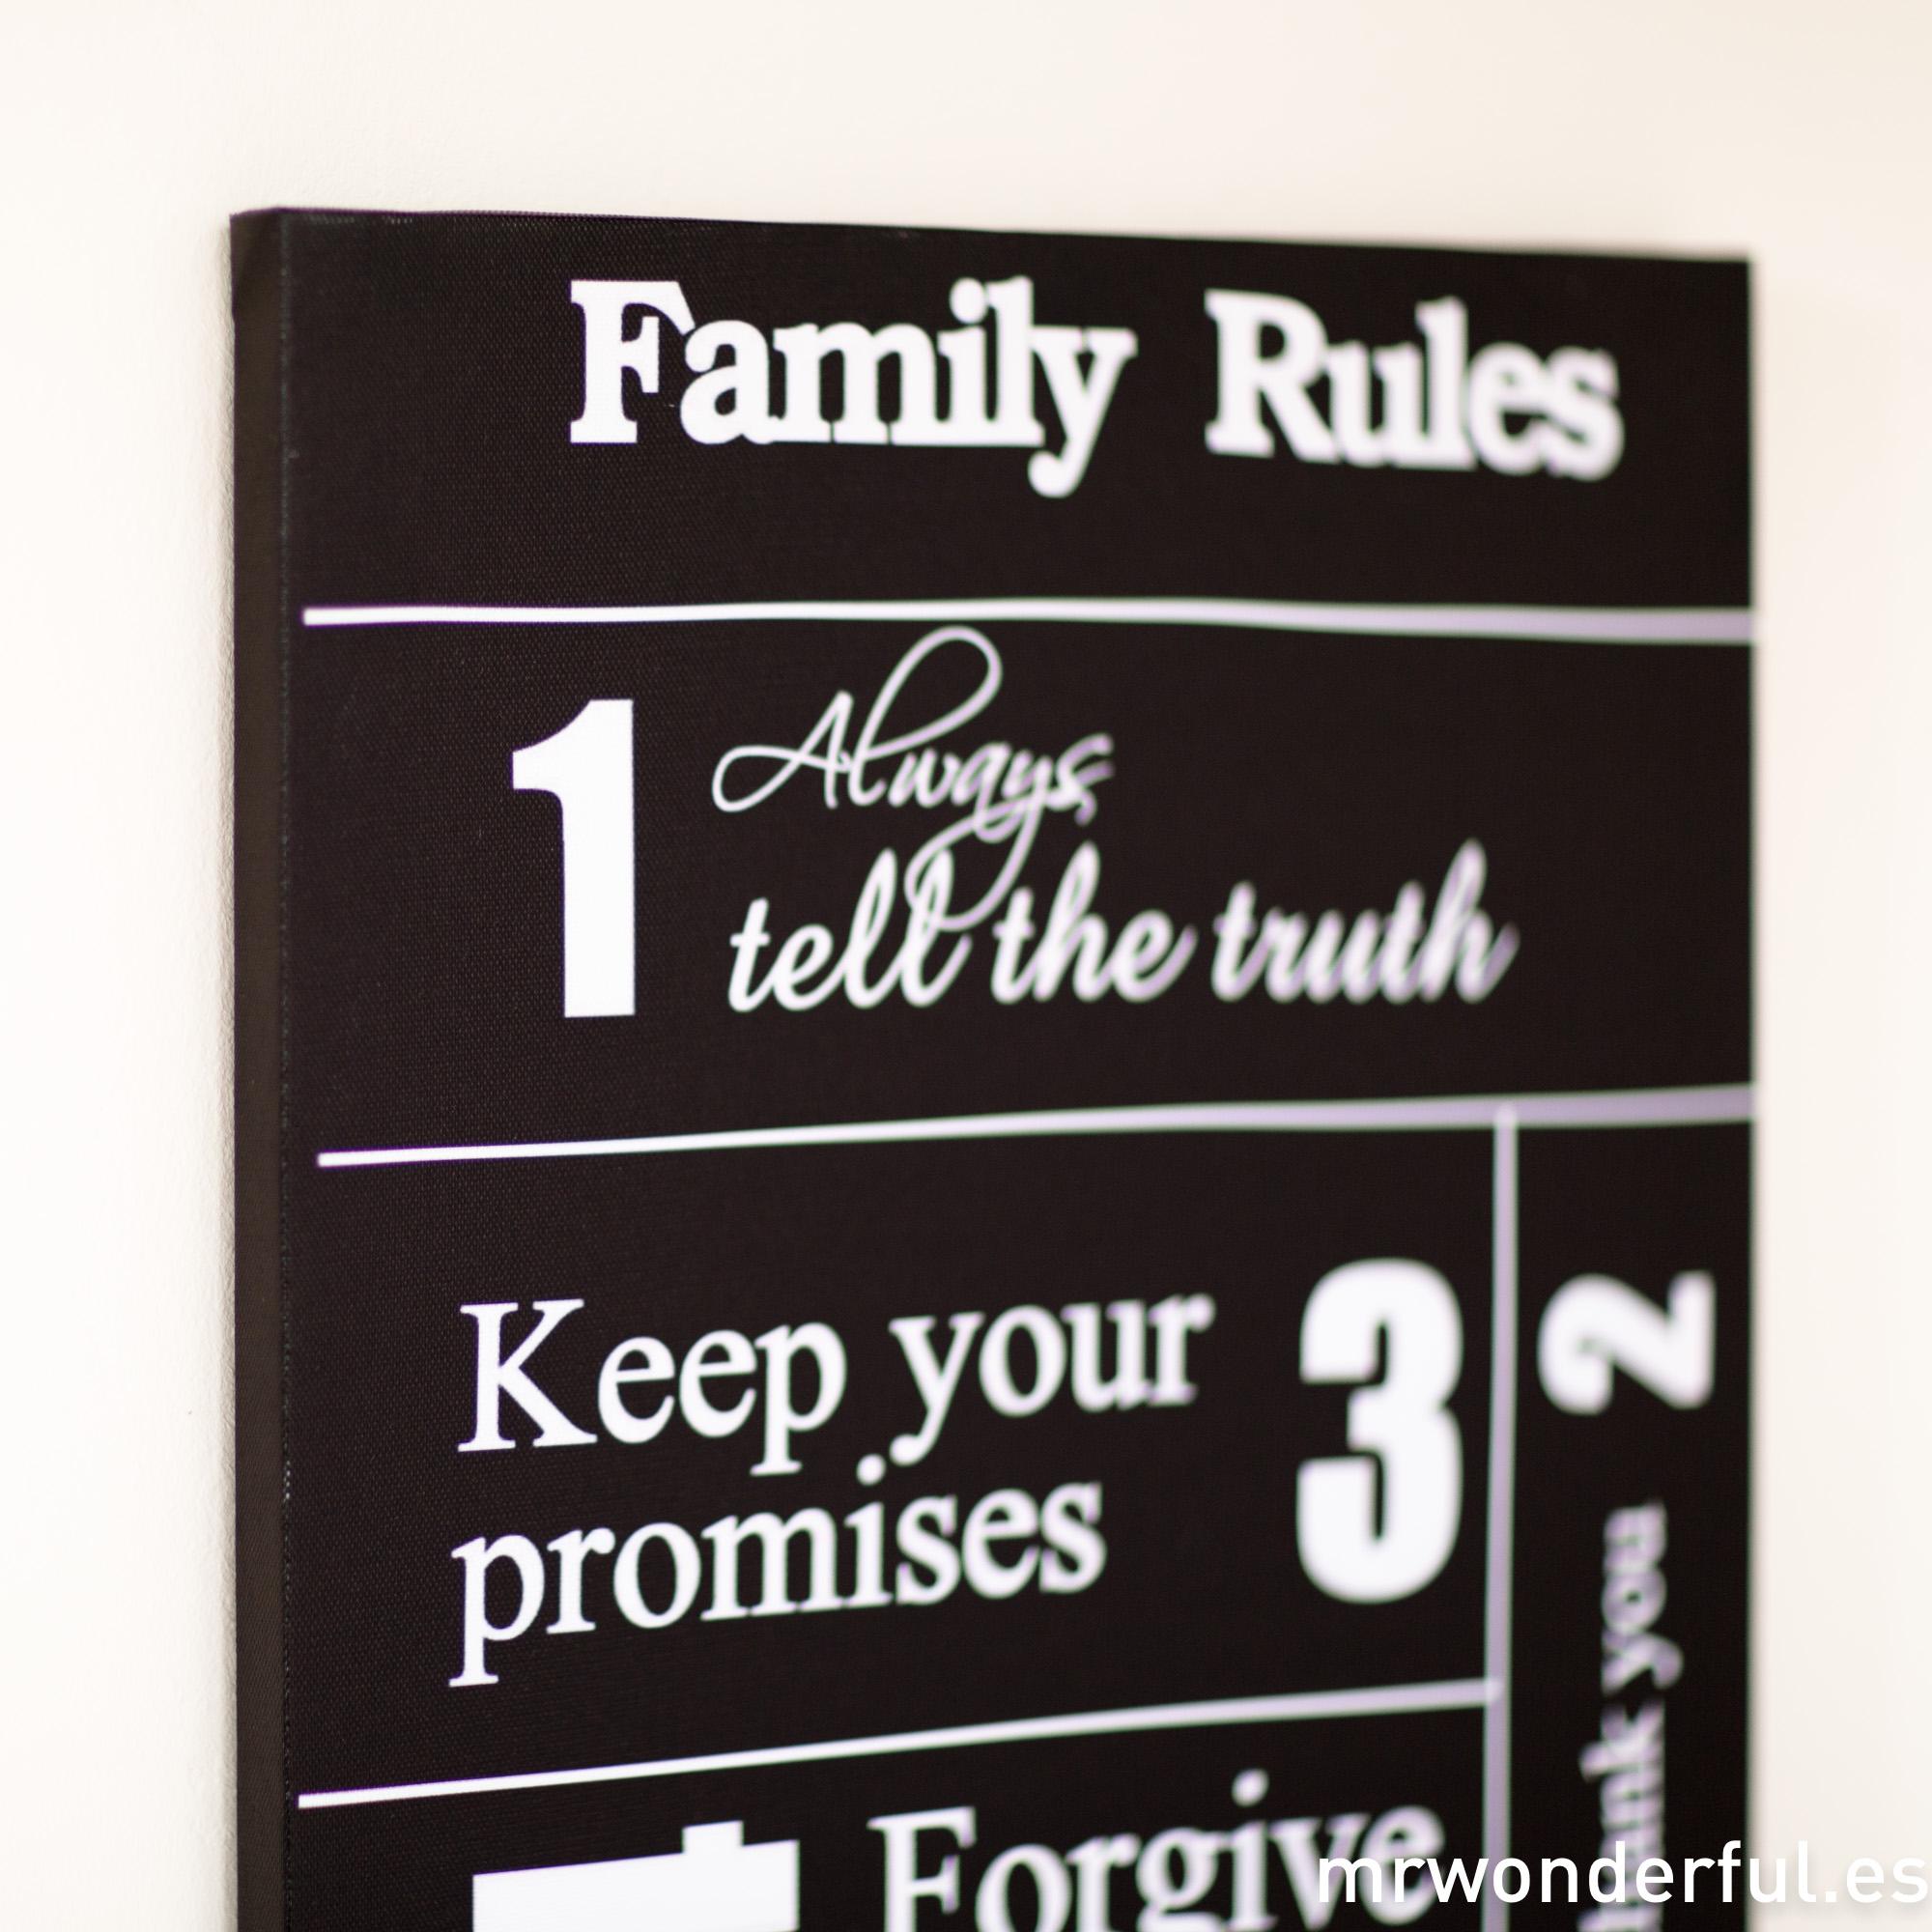 mrwonderful_wp1235_2_lienzo-family-rules-negro-8